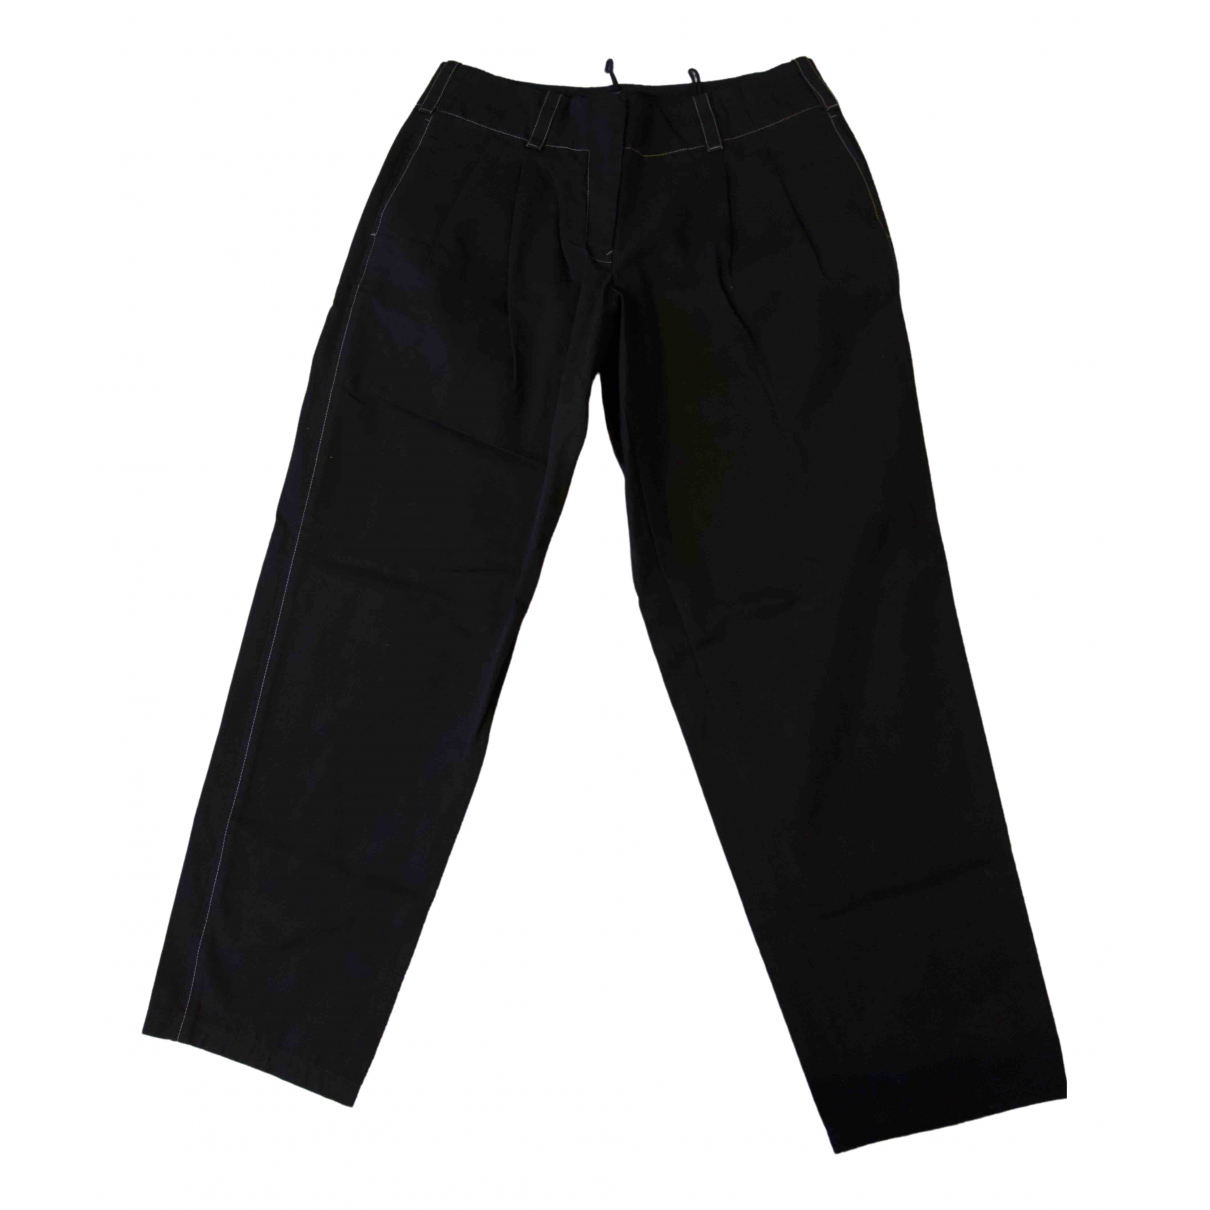 Jil Sander \N Black Cotton Trousers for Women 38 FR